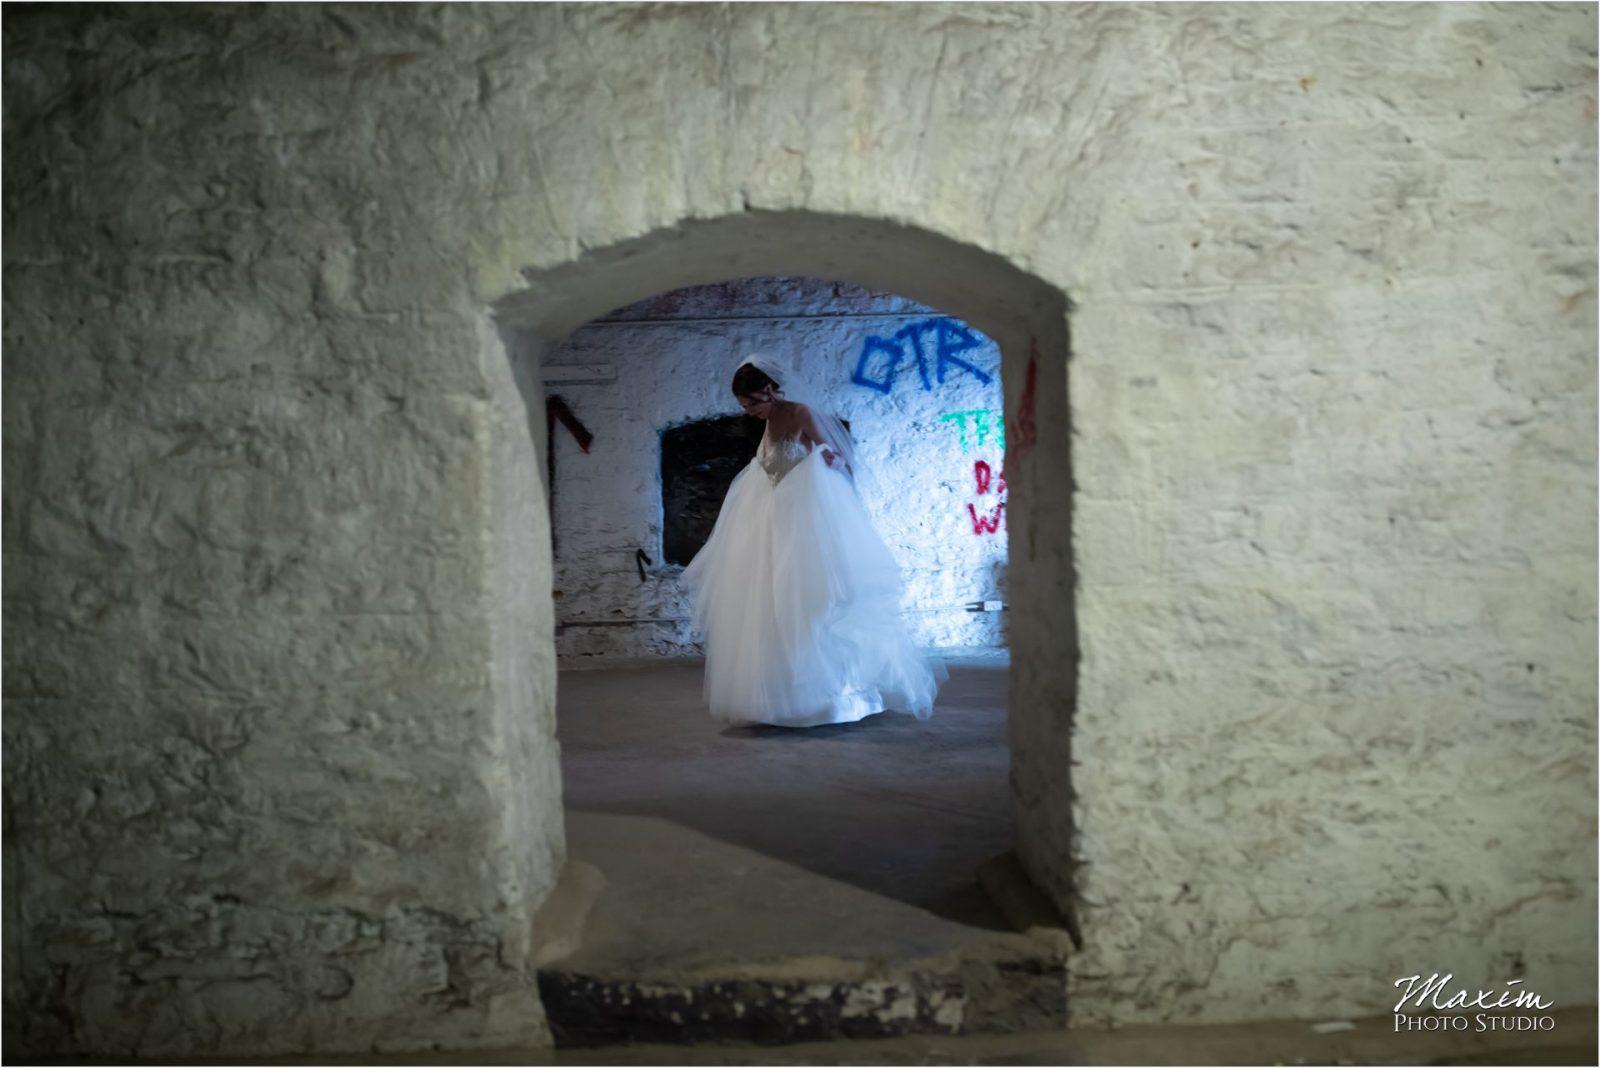 The Mockbee Cincinnati Wedding Ceremony bride